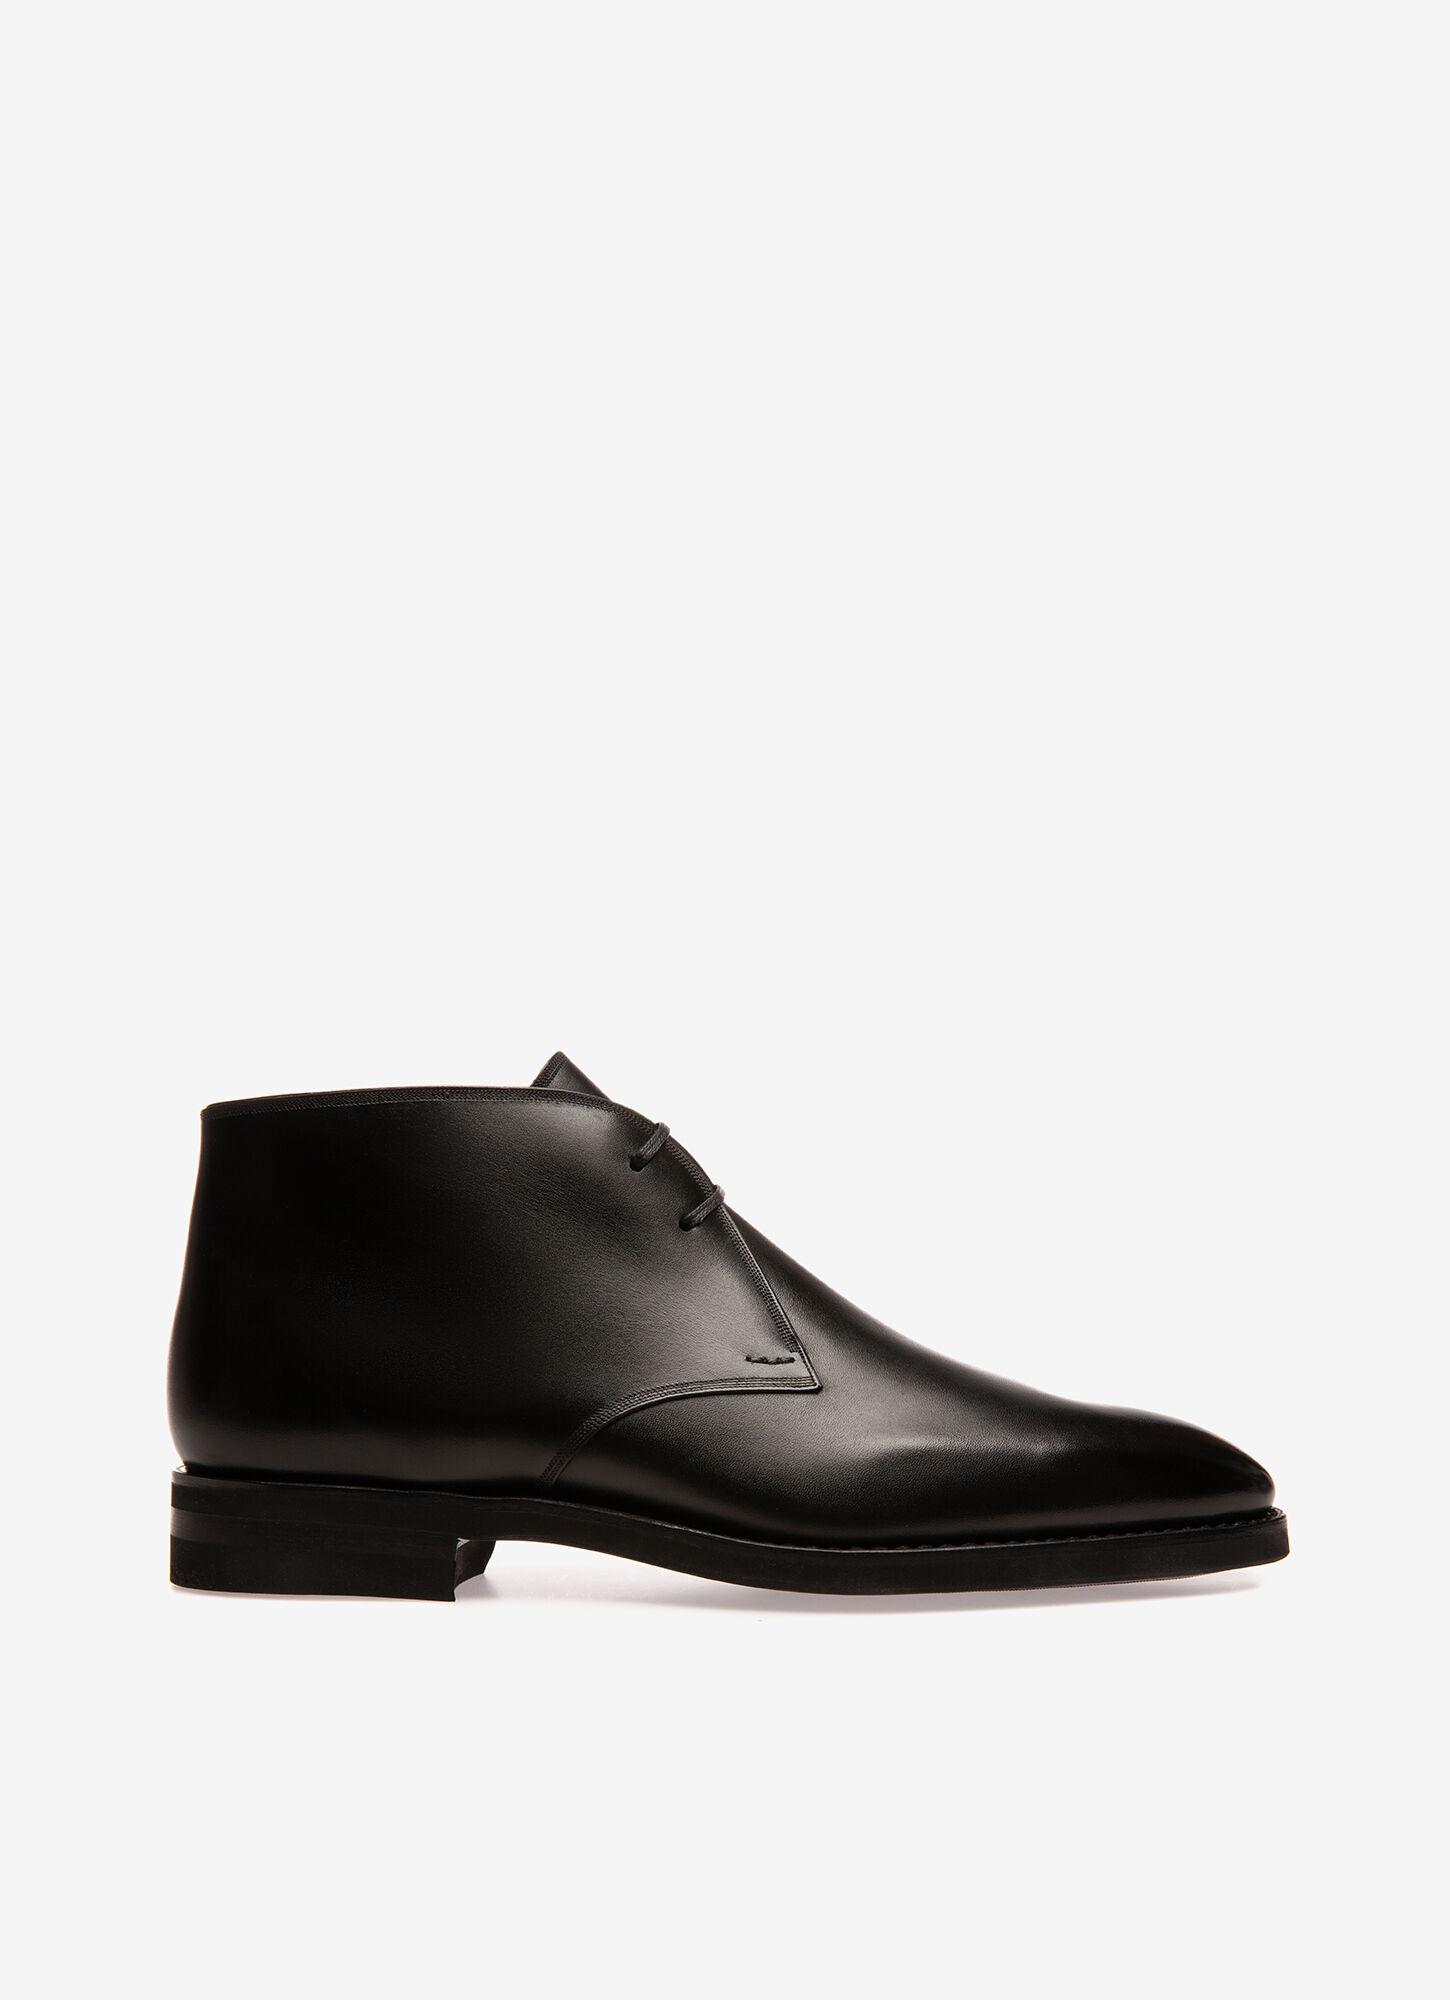 black leather desert boots